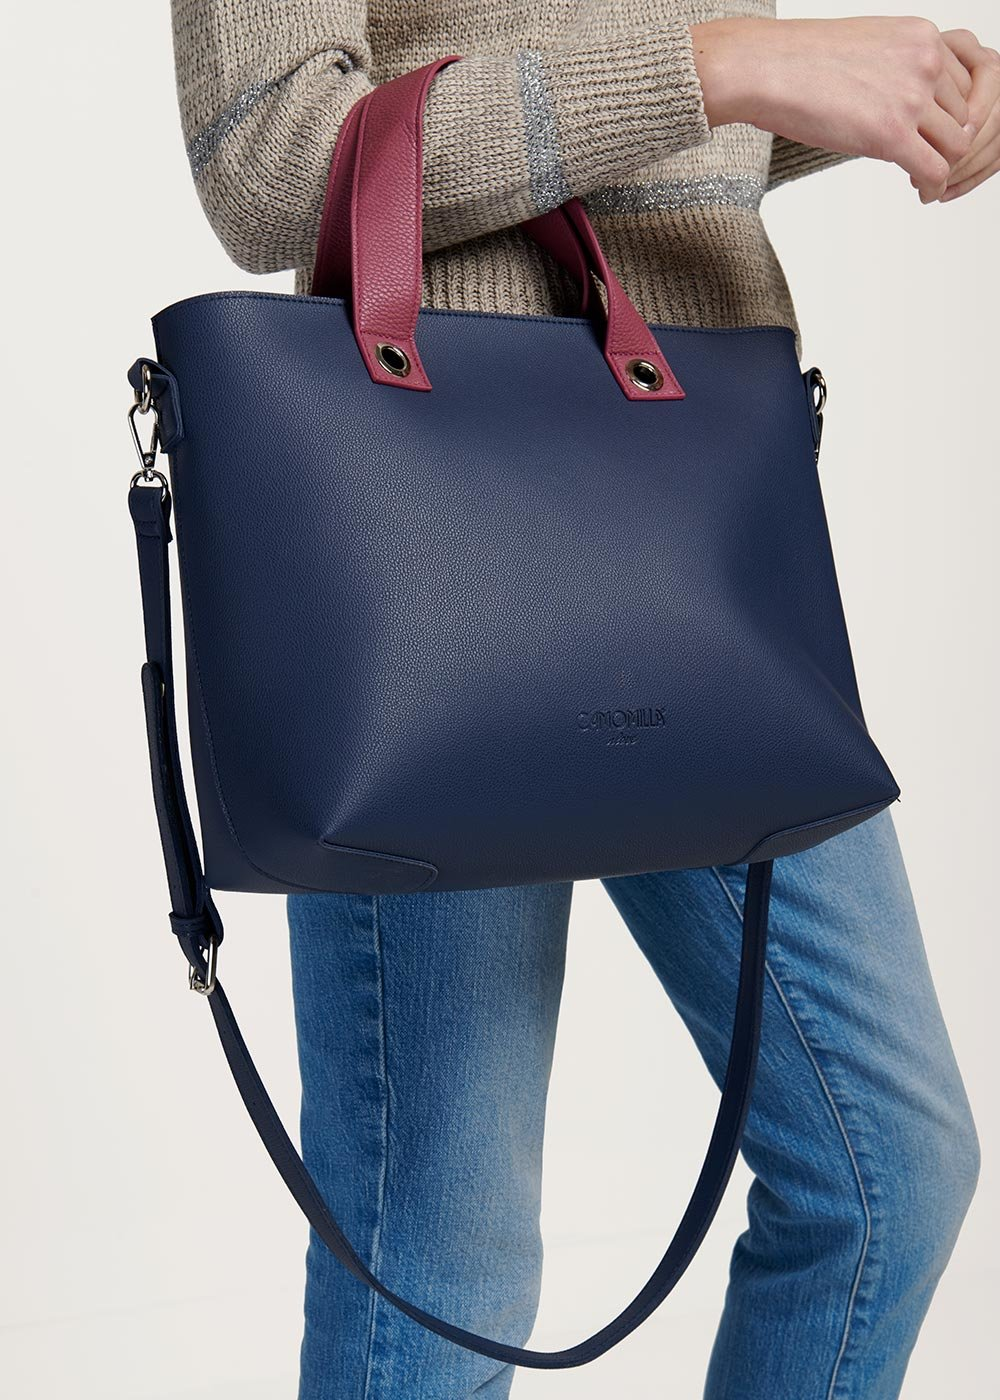 Shopping bag Bessie bicolor - Marina / Dalia - Donna